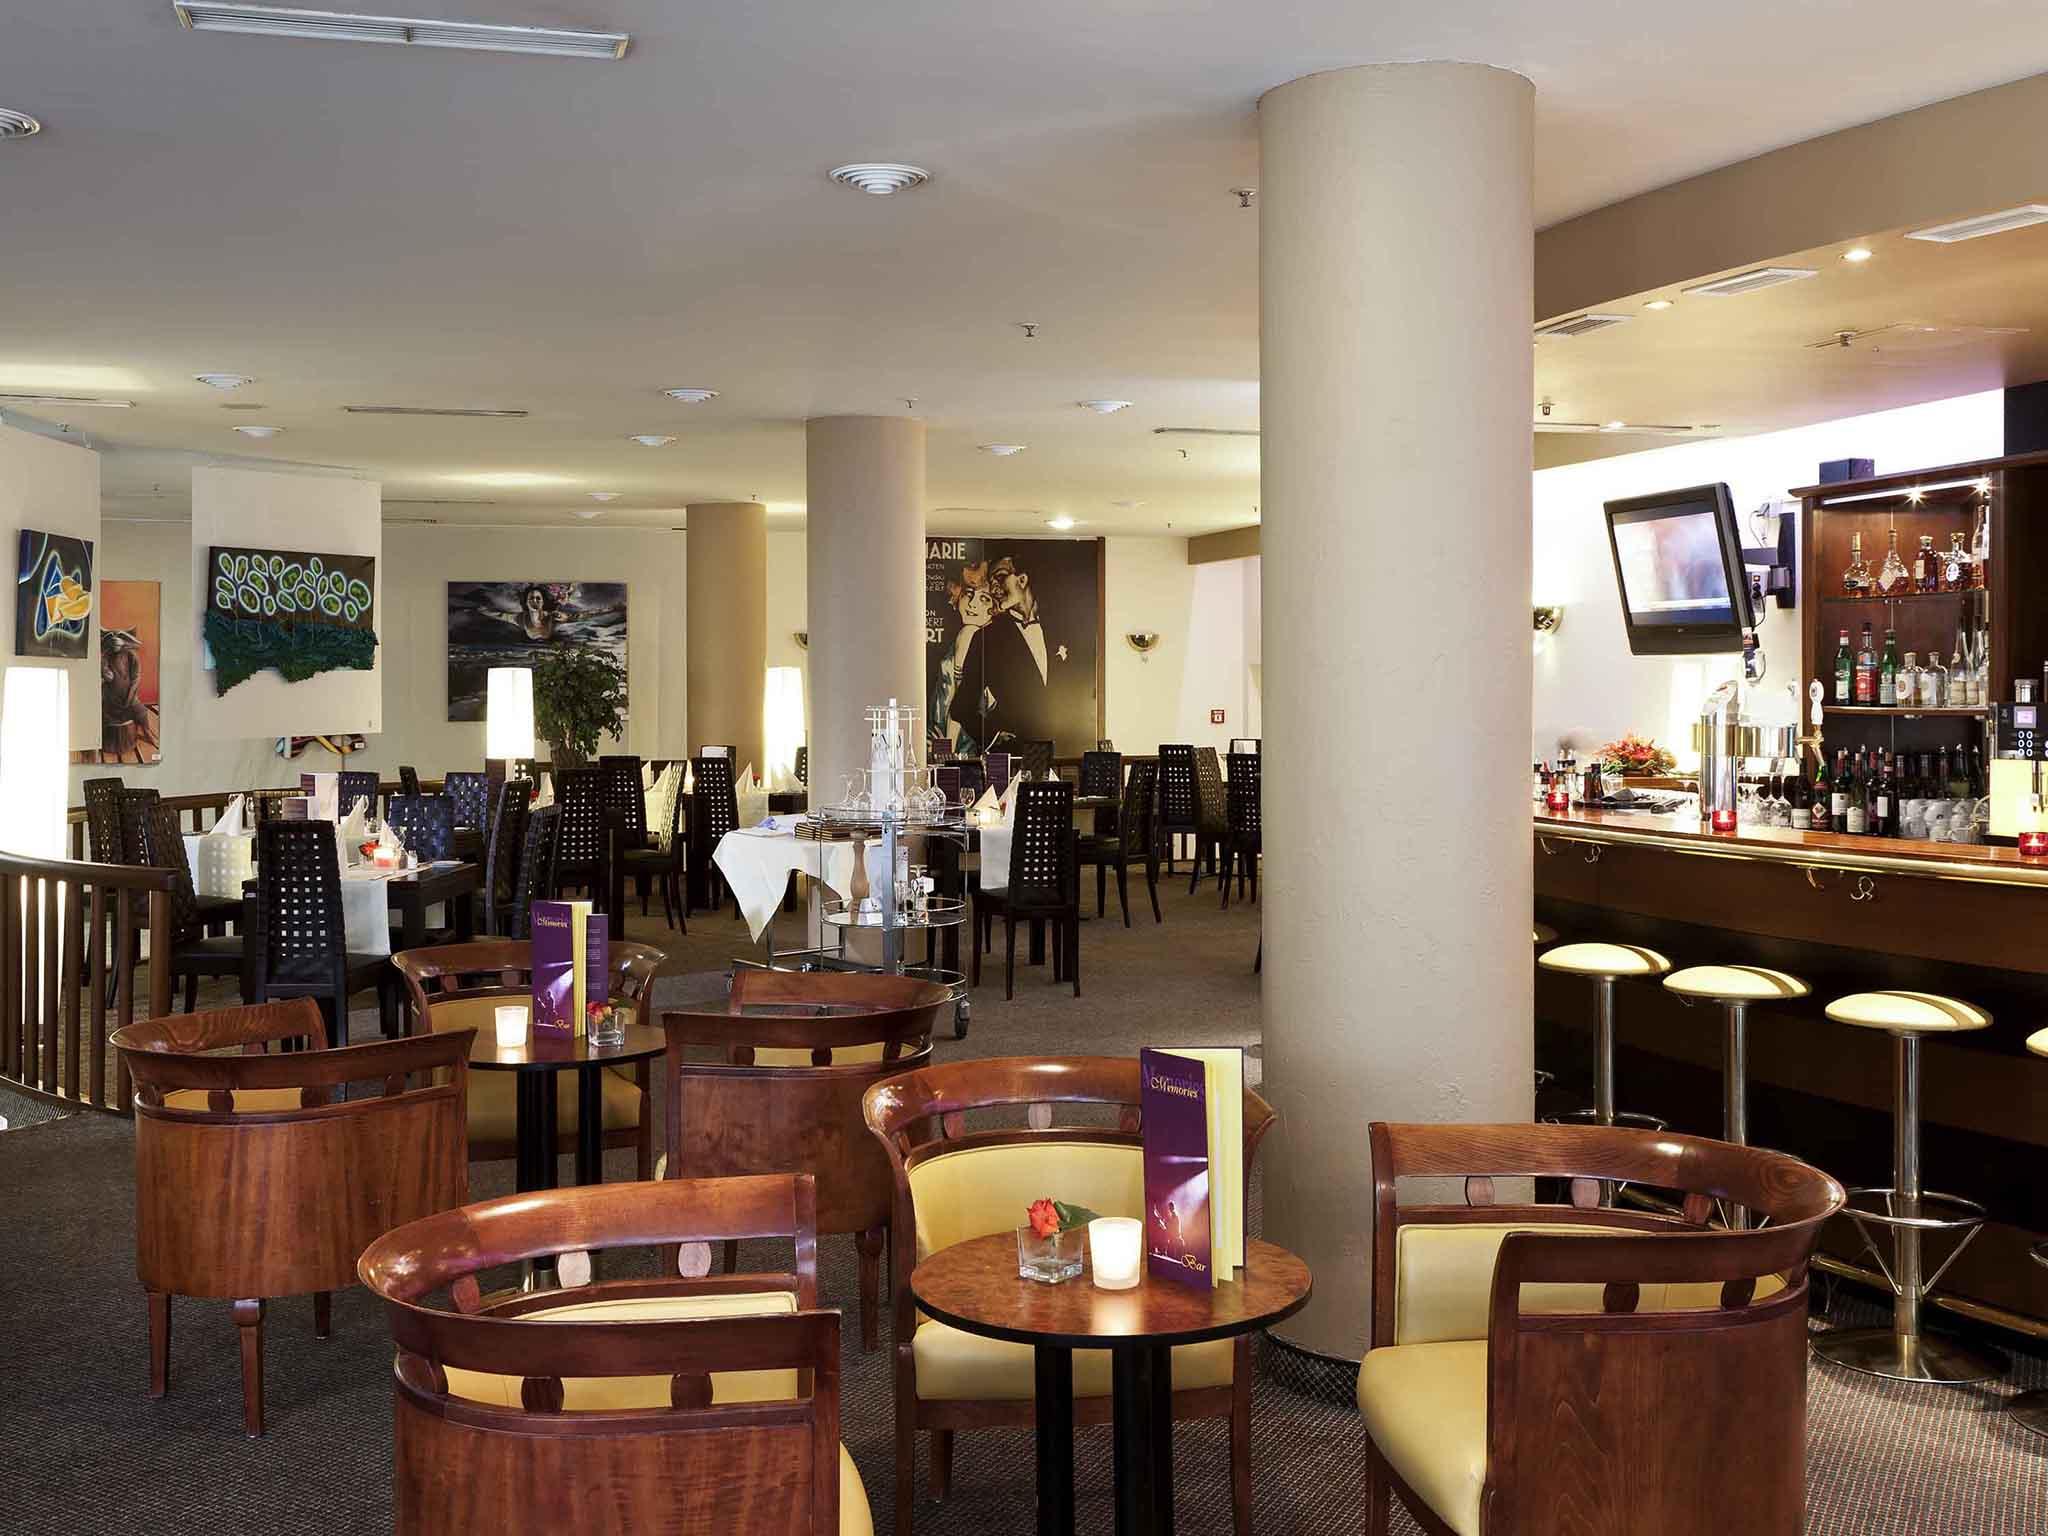 4 Sterne Hotel Berlin Tempelhof Mercure